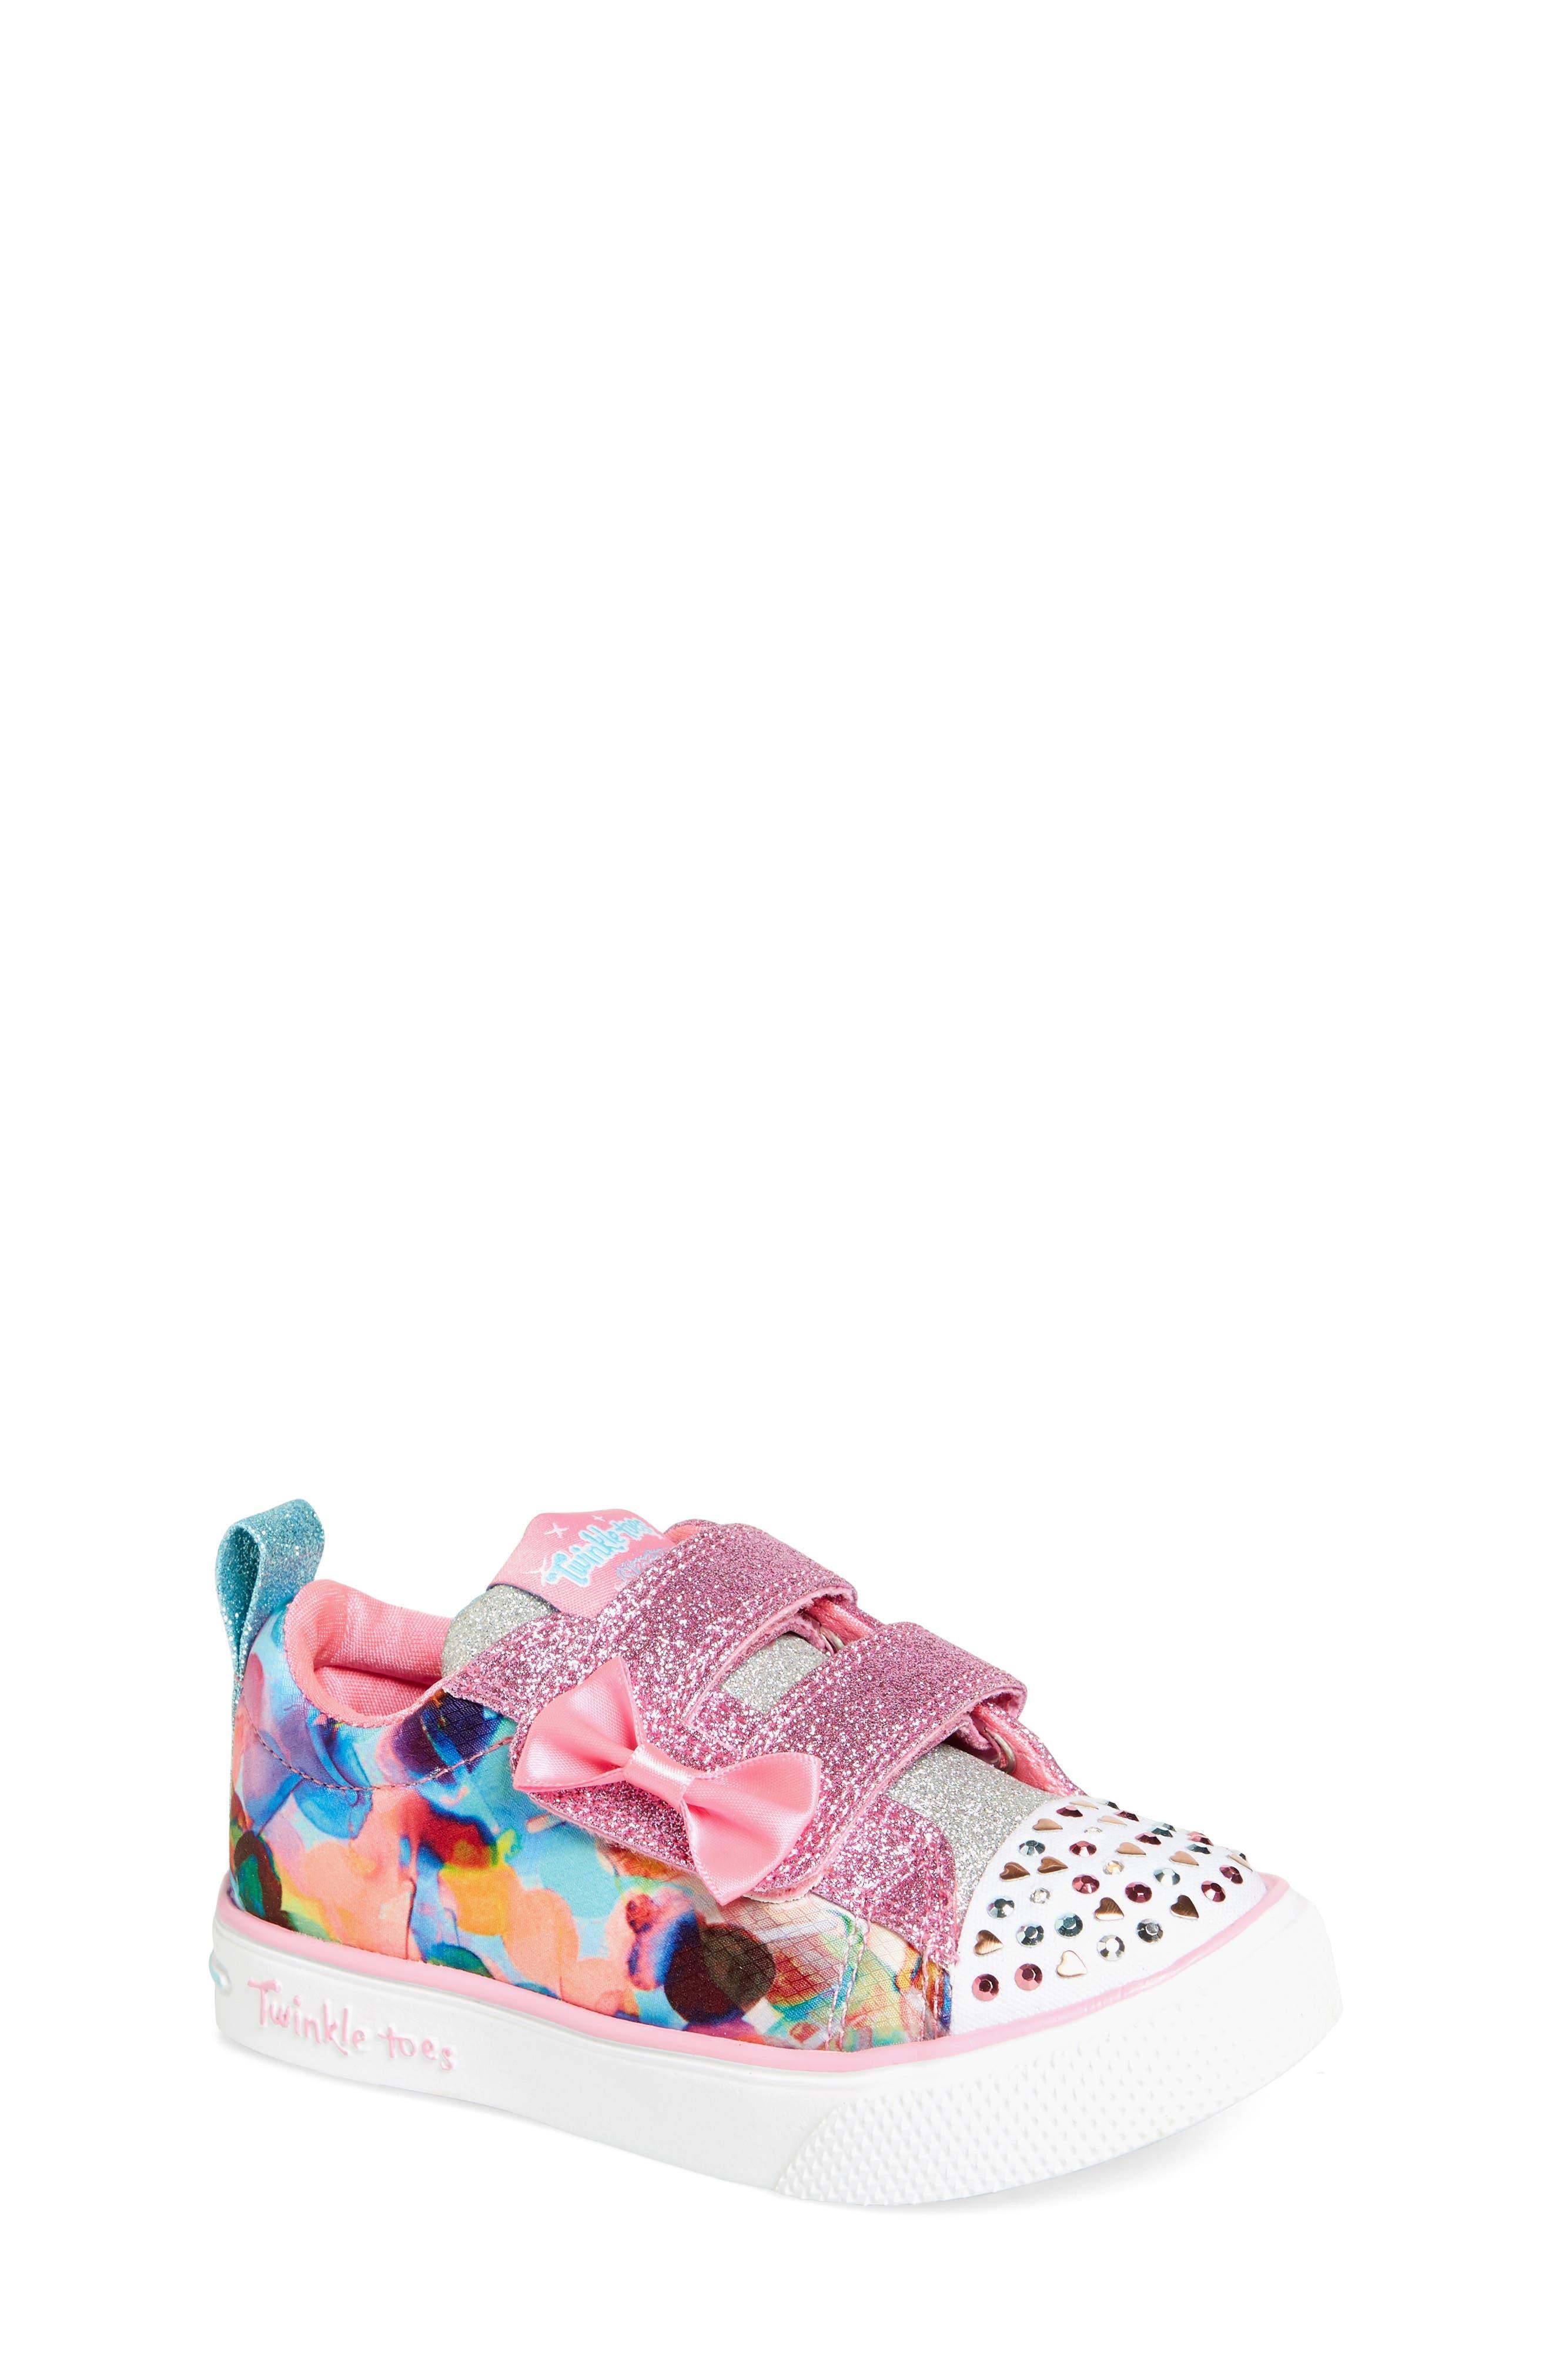 Twinkle Breeze 2.0 Princess Sneaker,                             Main thumbnail 1, color,